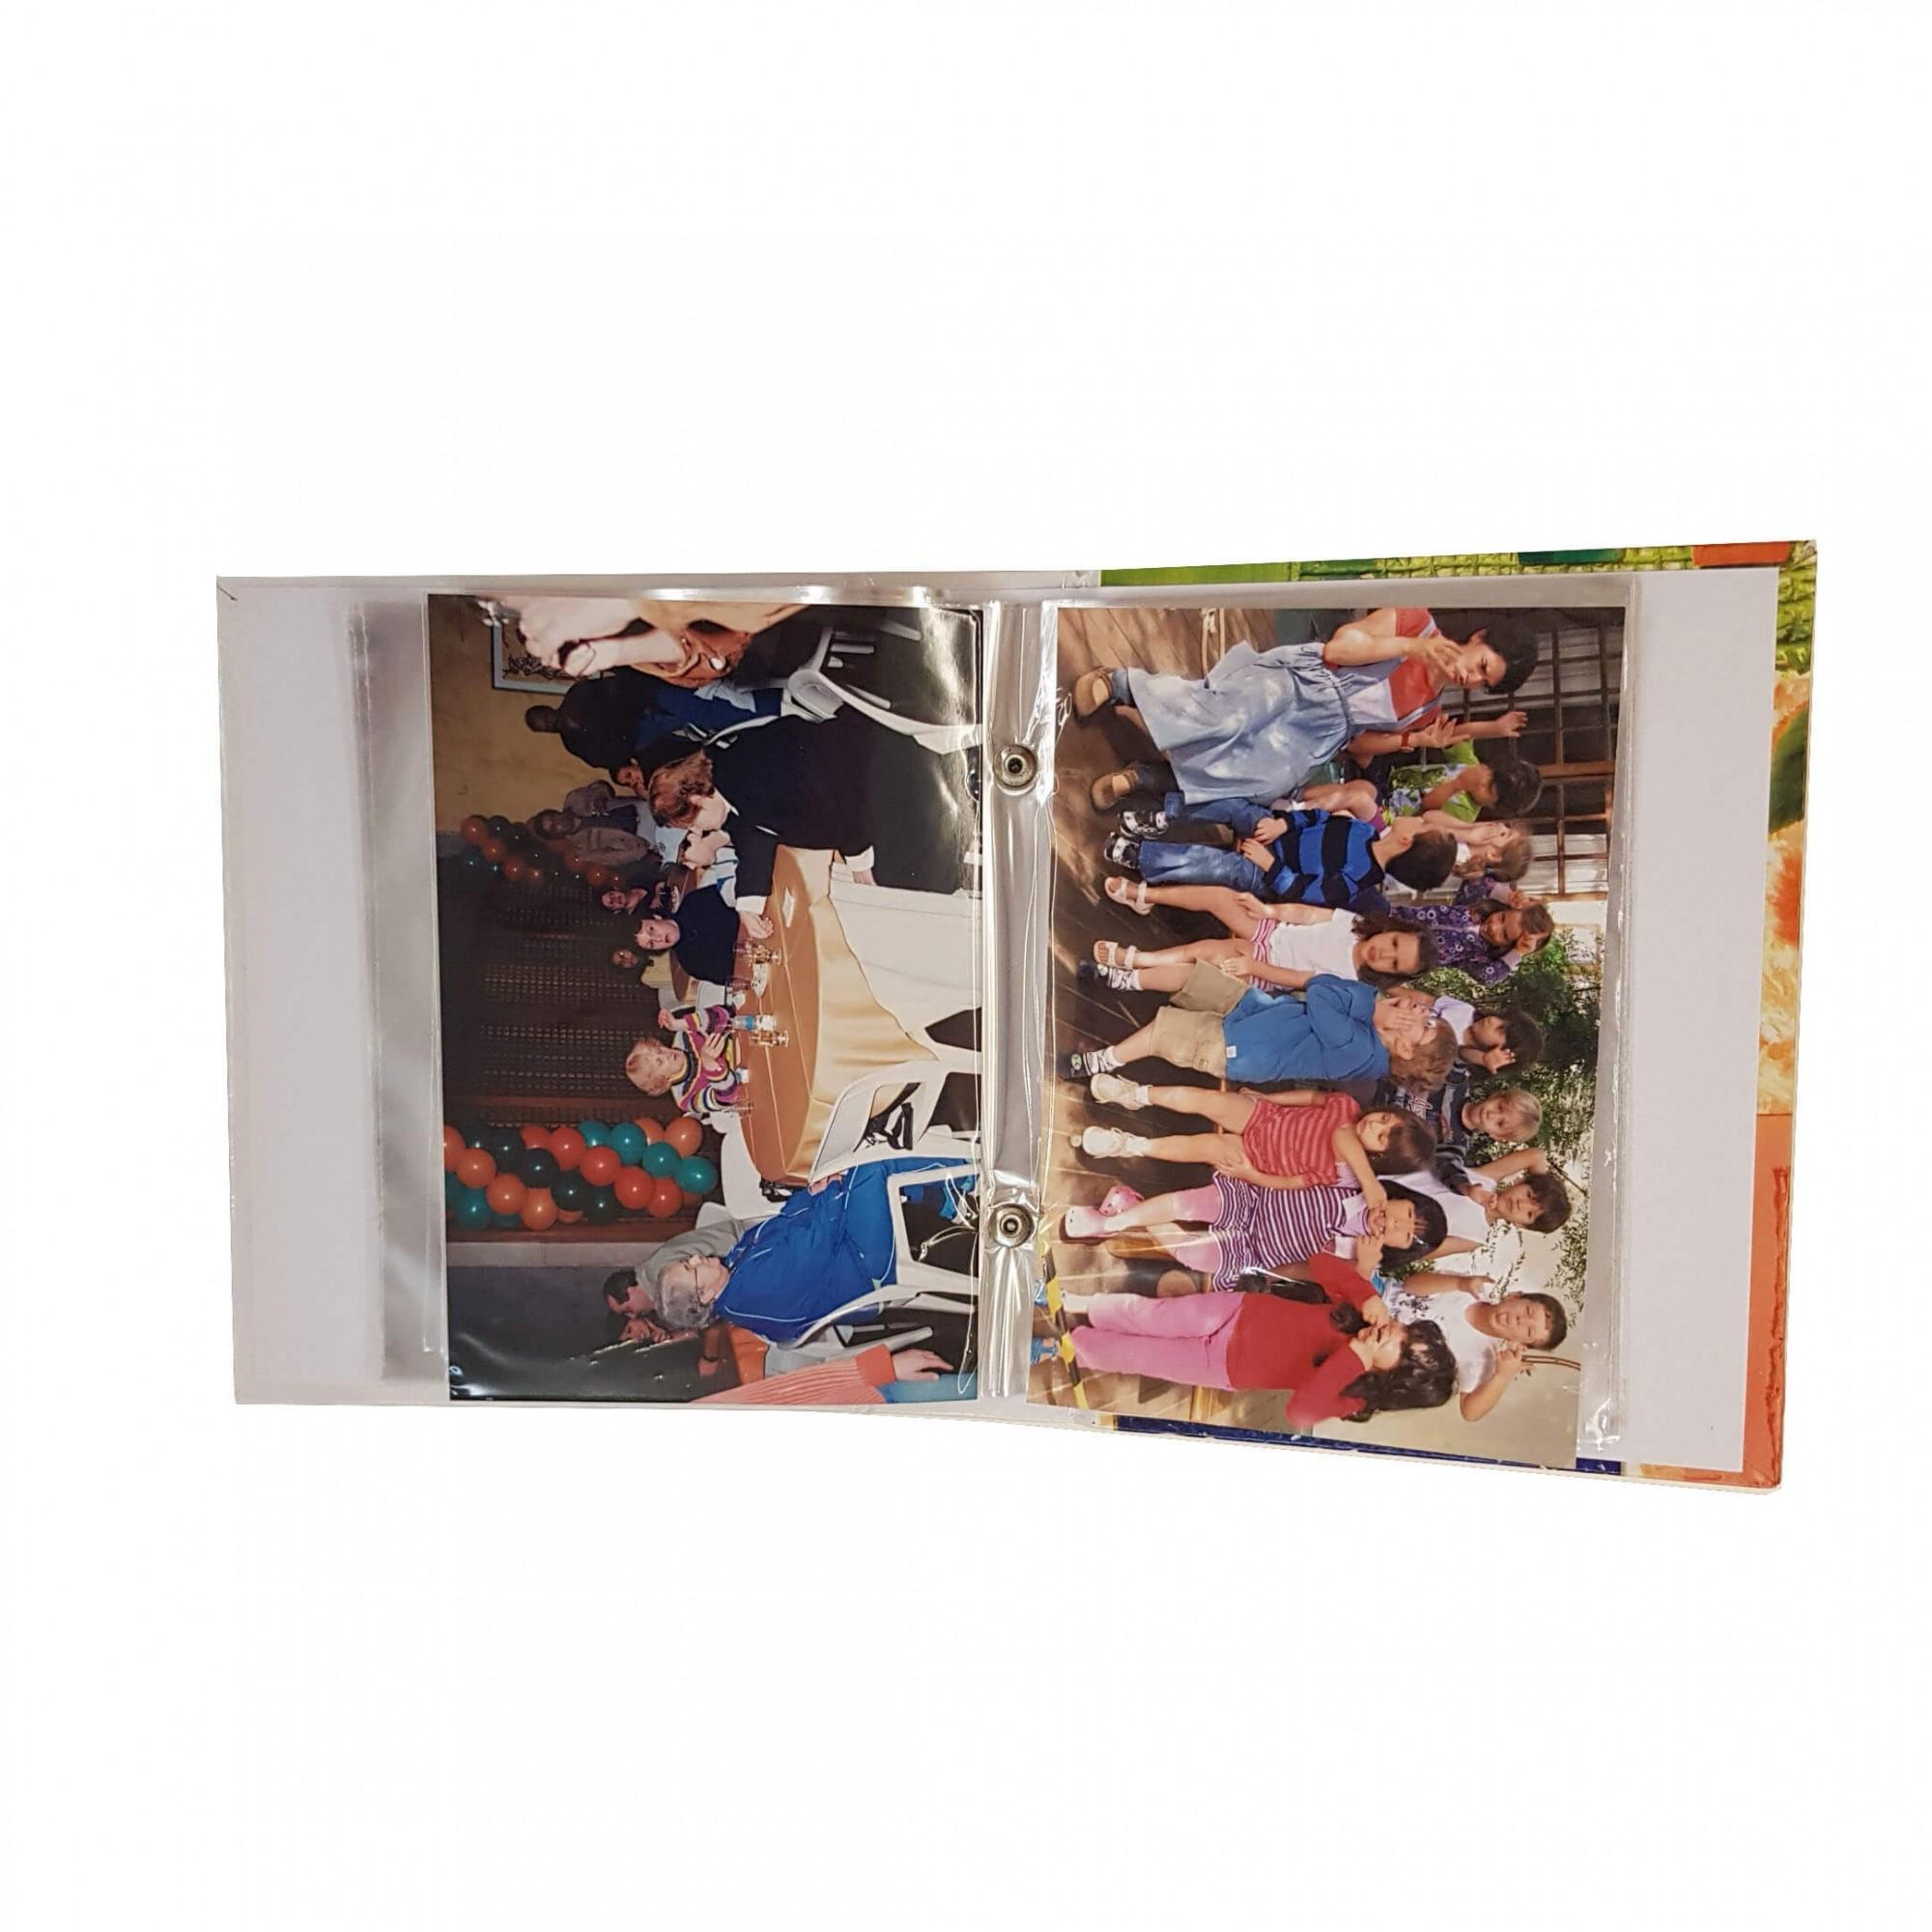 4  Album 10x15 120 Fotos Veludo Couro Ou Glitter 480Fotos